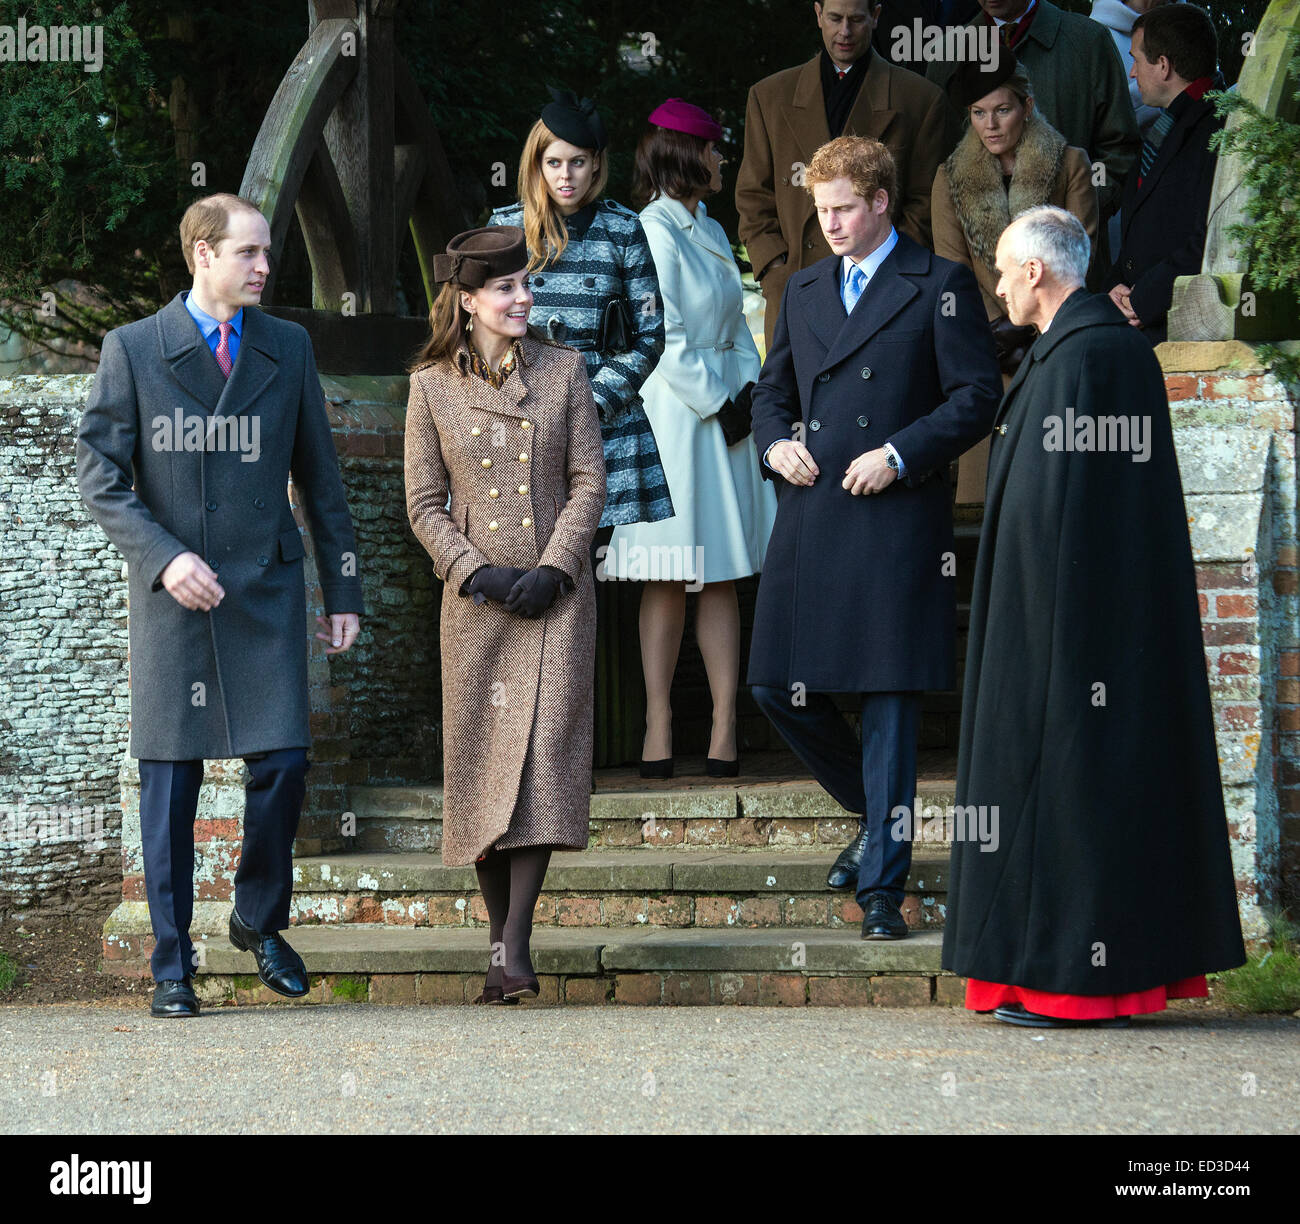 Sandringham, UK. 25th Dec, 2014. The Royal Family attends the ...